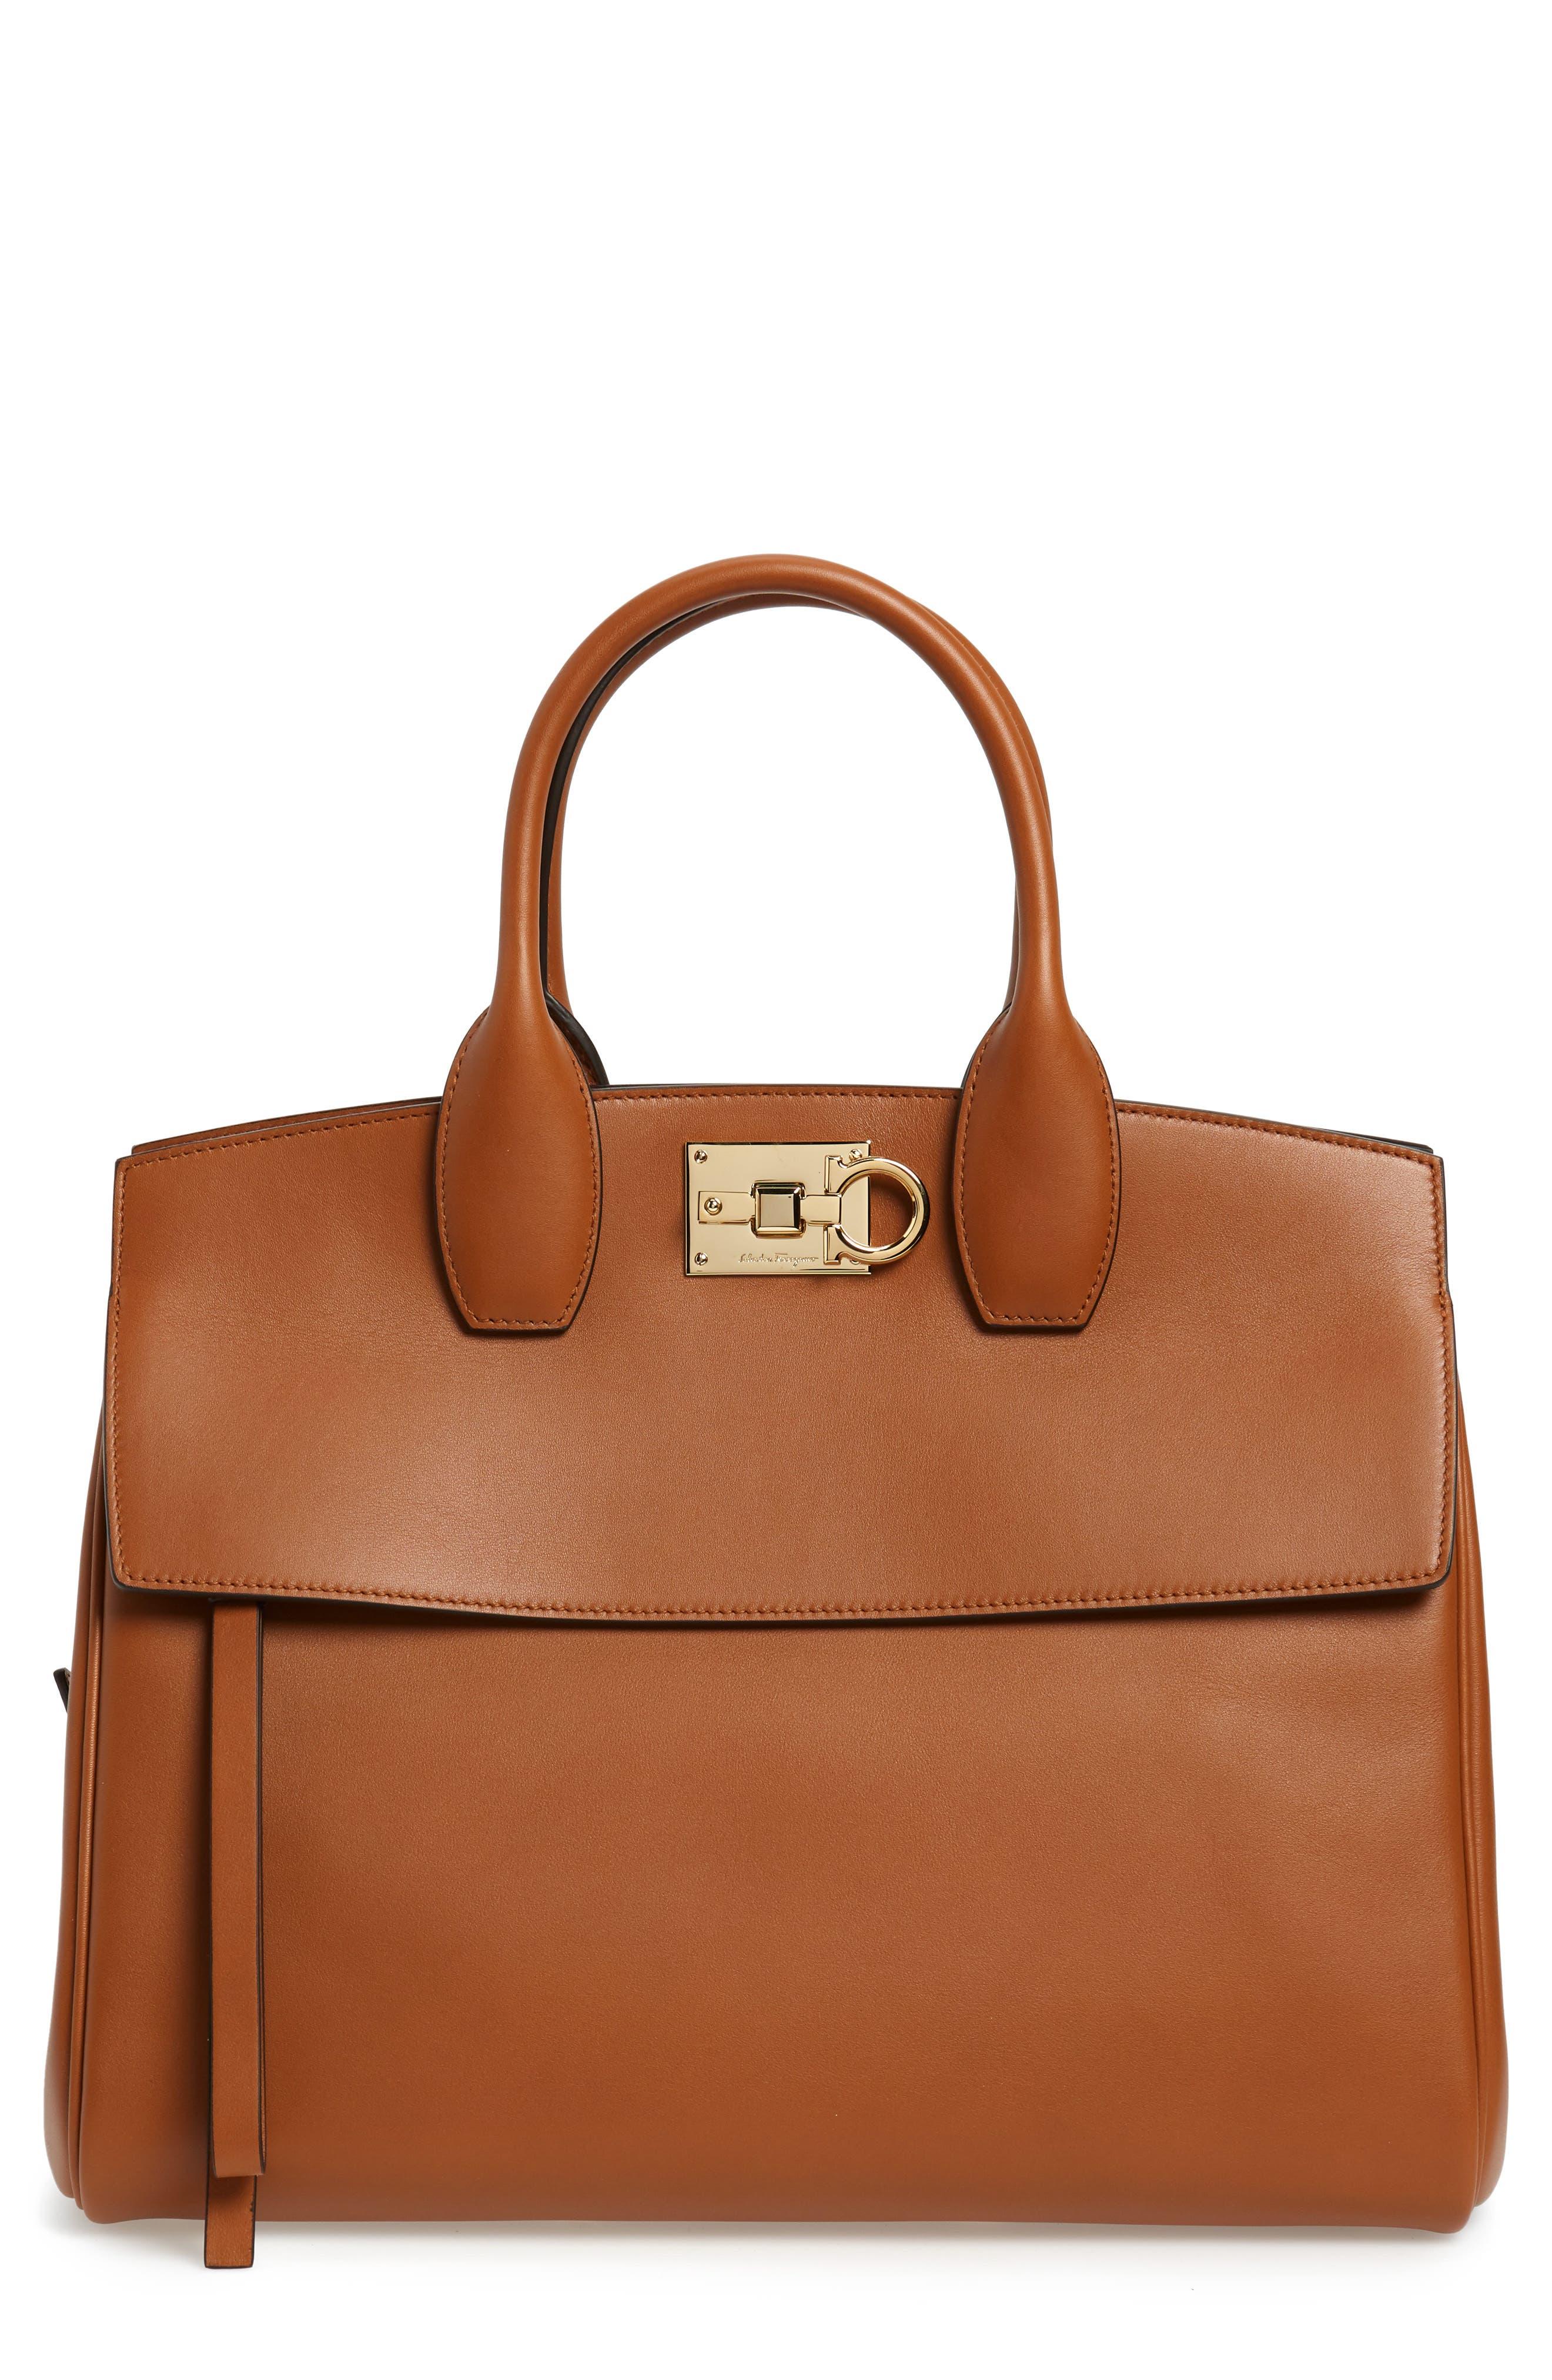 SALVATORE FERRAGAMO Medium The Studio Calfskin Leather Top Handle Bag, Main, color, SELLA